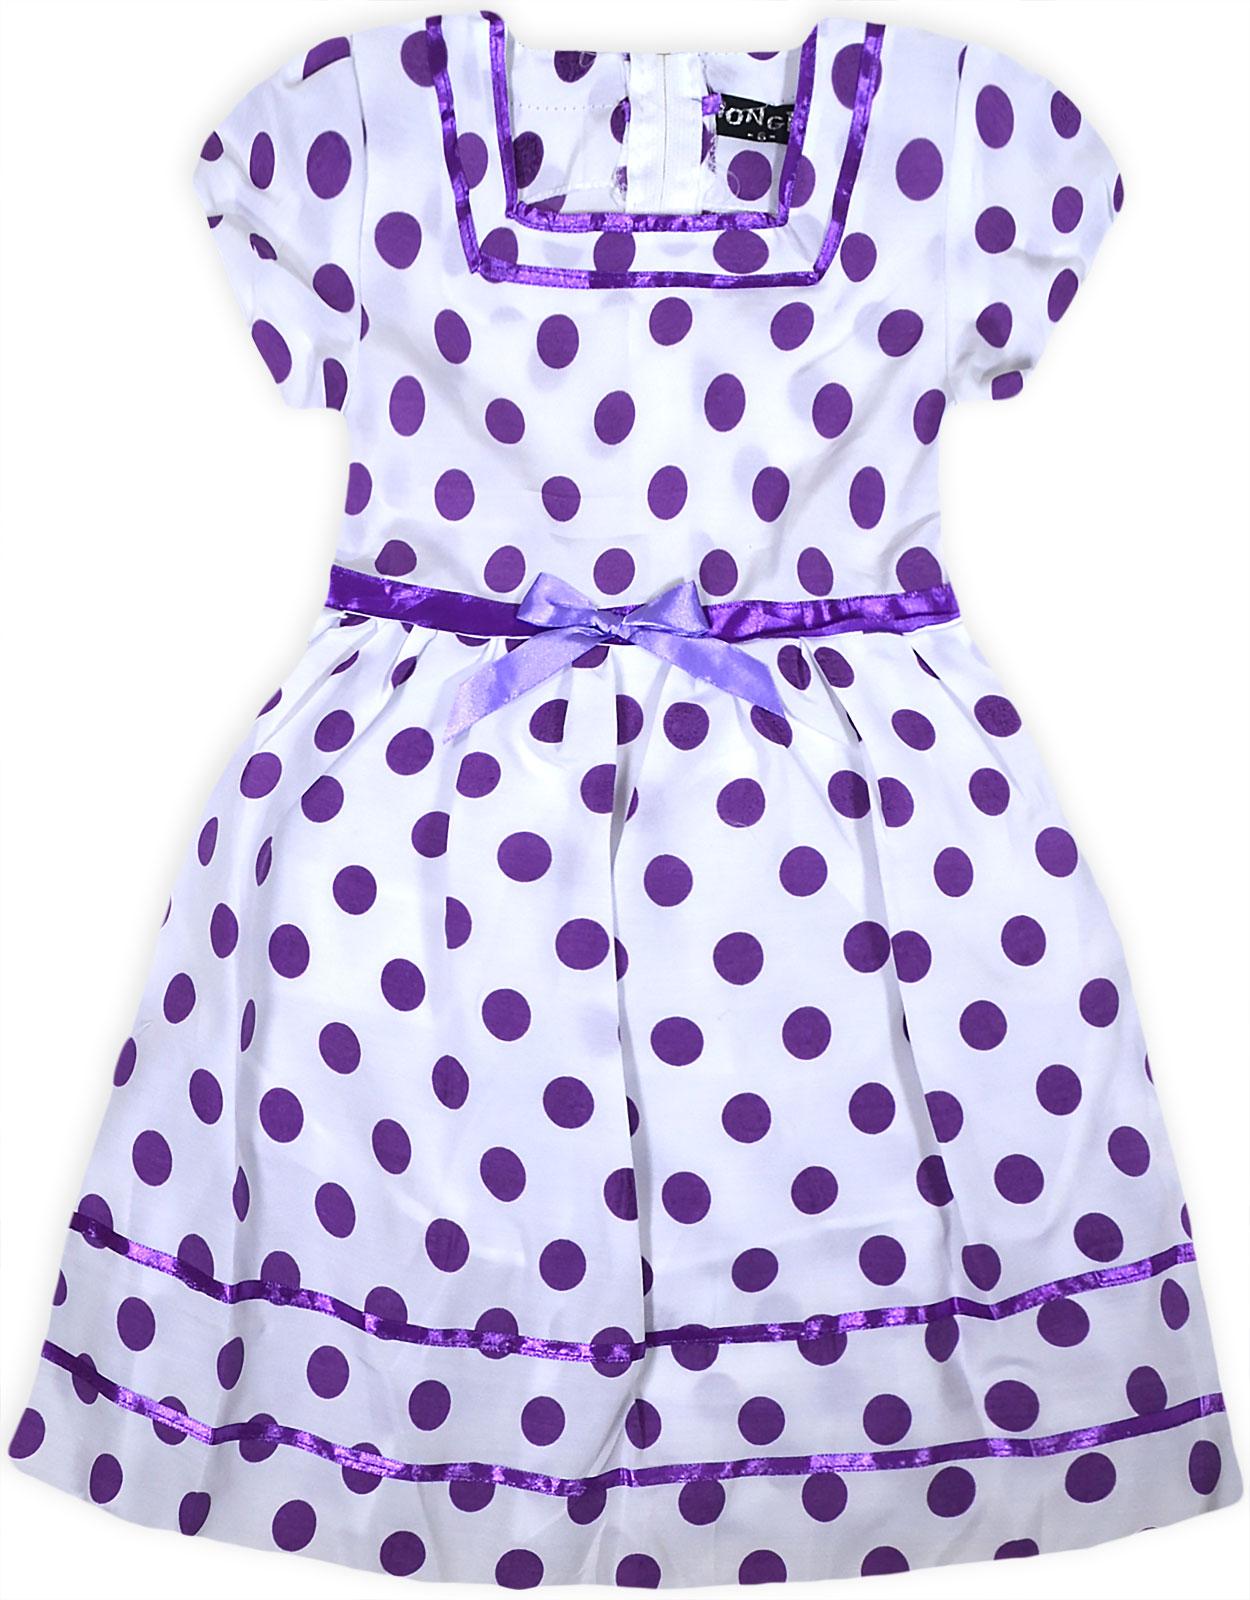 Girls New Polka Dot Dress Kids Princess Spot Short Sleeve Party ...